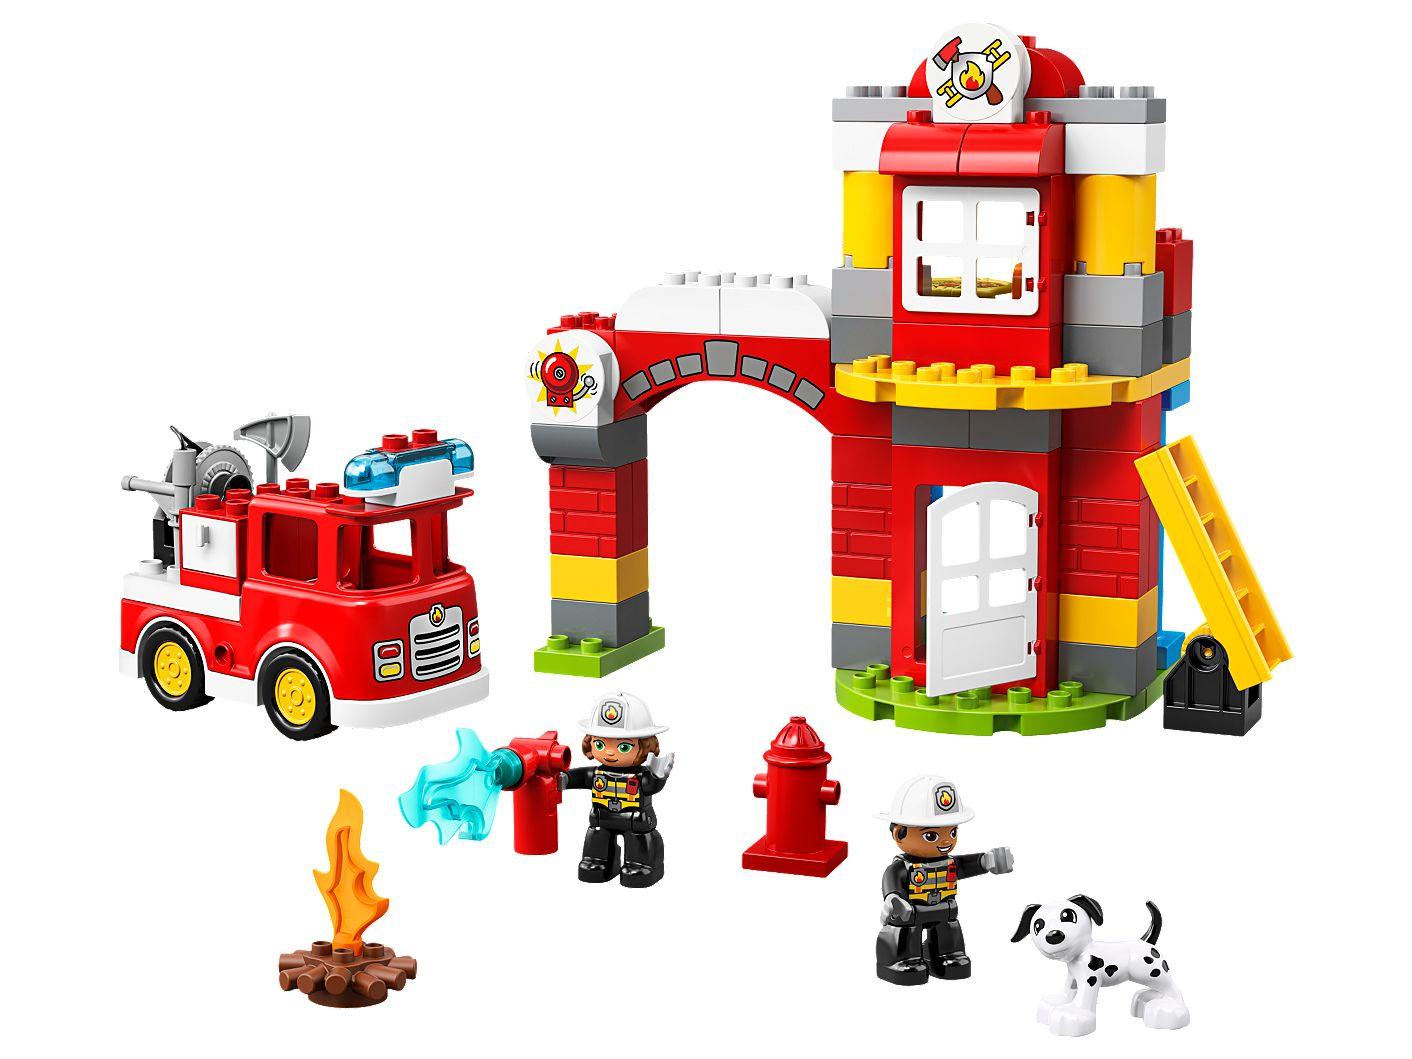 Lego Duplo Item Fire Extinguisher Red